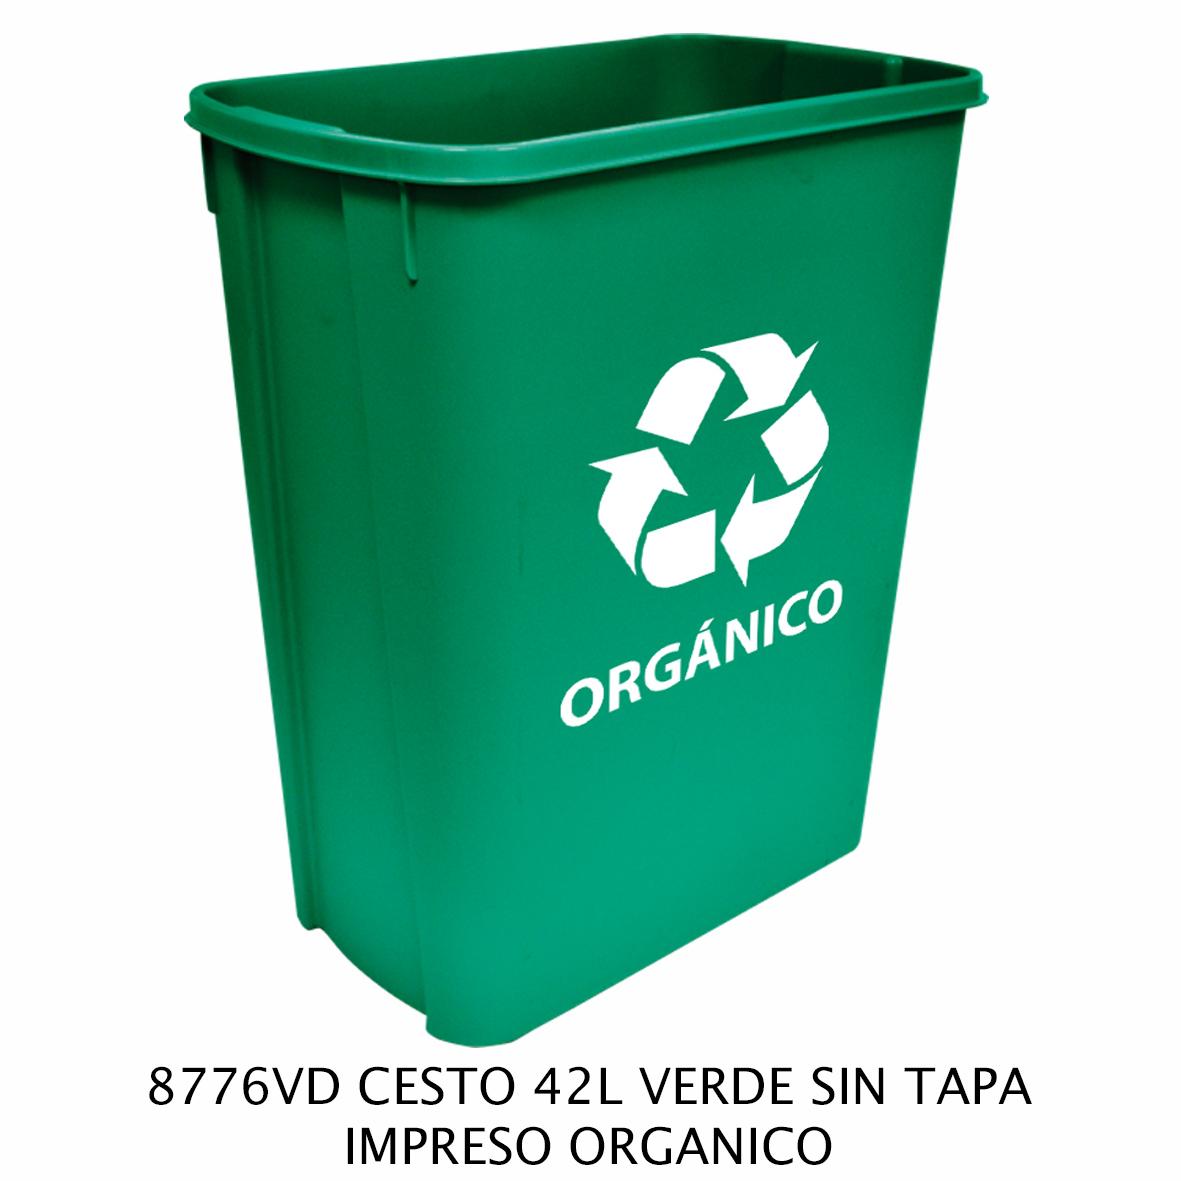 Bote de basura mediano de 42 litros sin tapa color verde modelo 8776VD impreso orgánico de Sablon